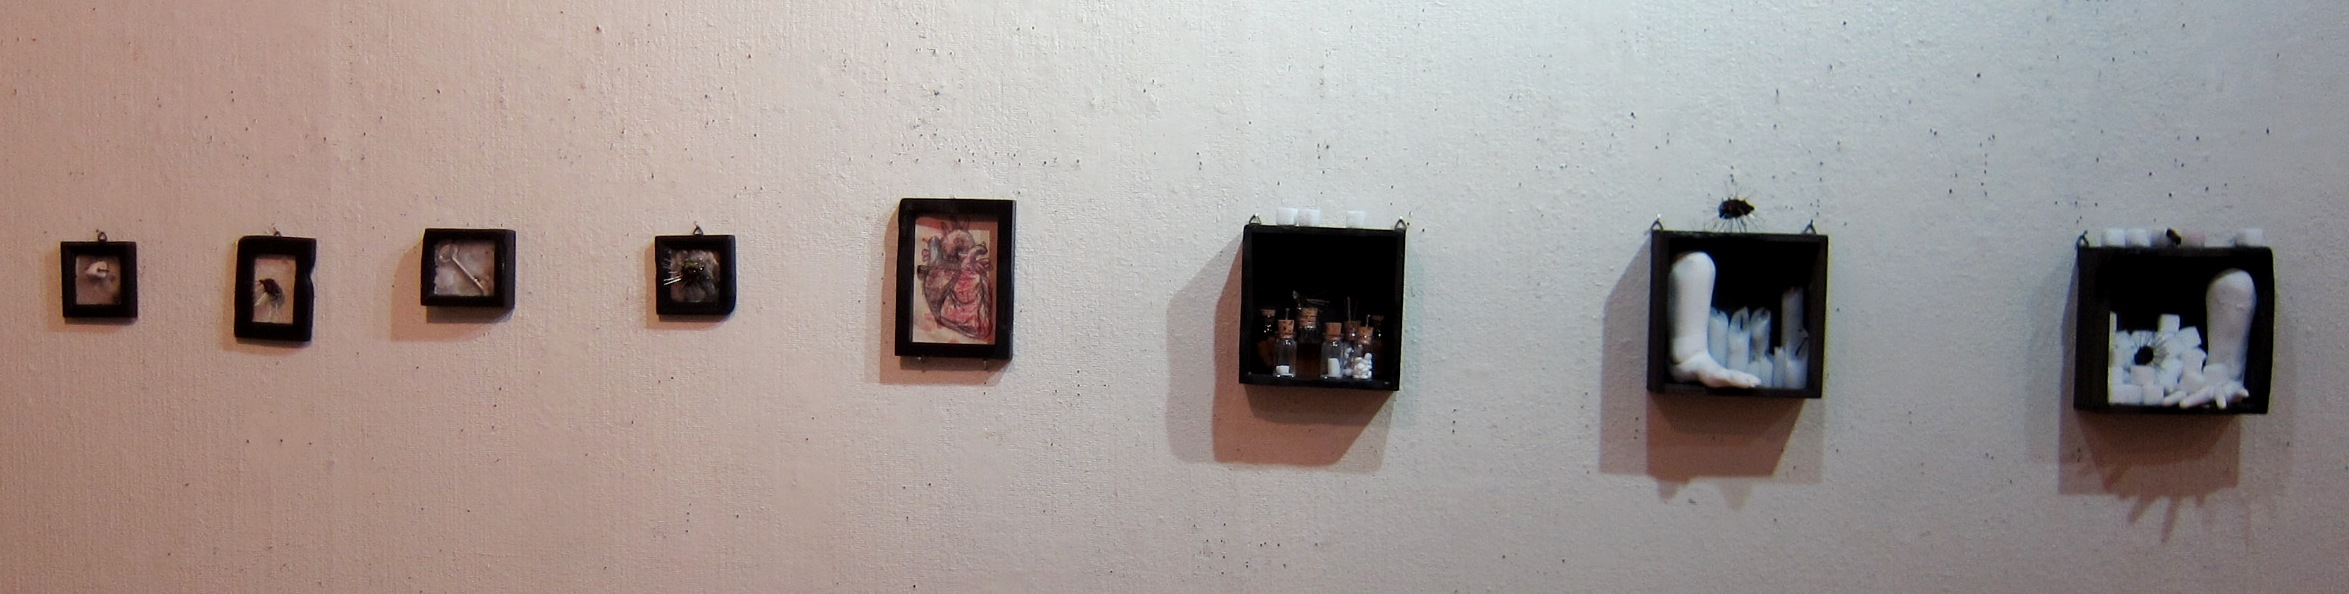 2240) 「BOX ART 7」 たぴお 終了/9月23日(月)~9月28日(土)_f0126829_11253281.jpg